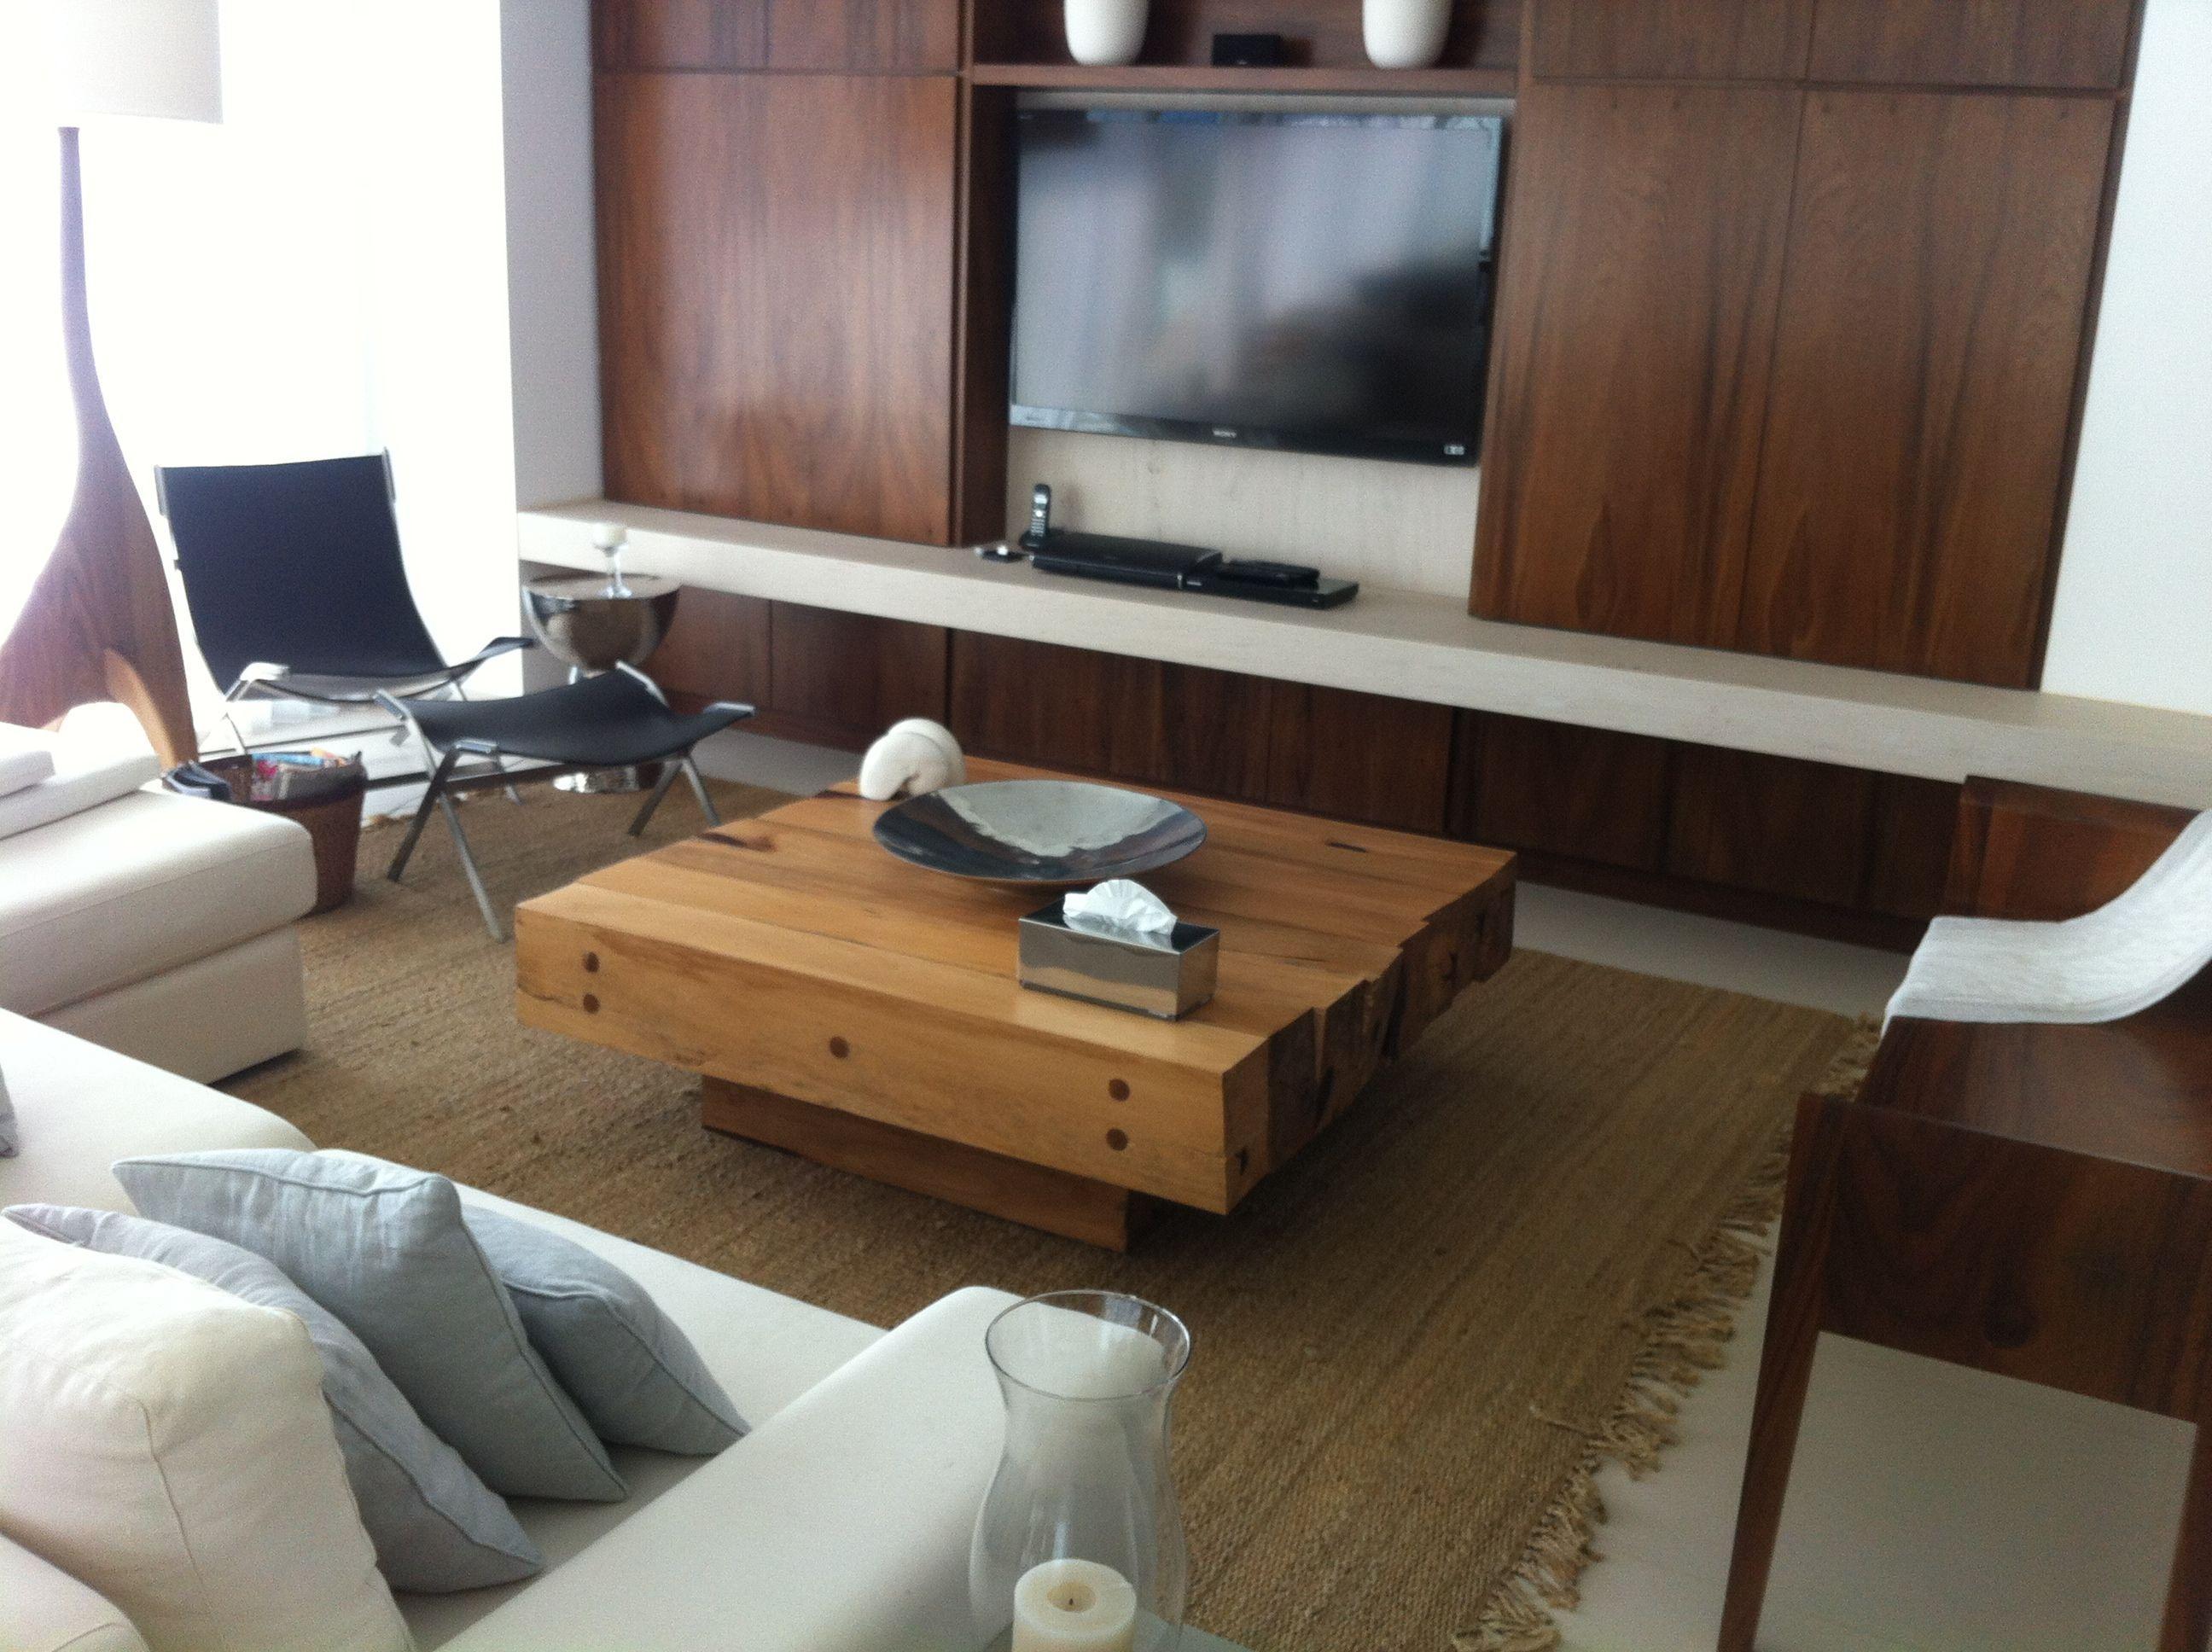 Transmuta guadalajara muebles de madera muebles - Mesas de arquitectura ...